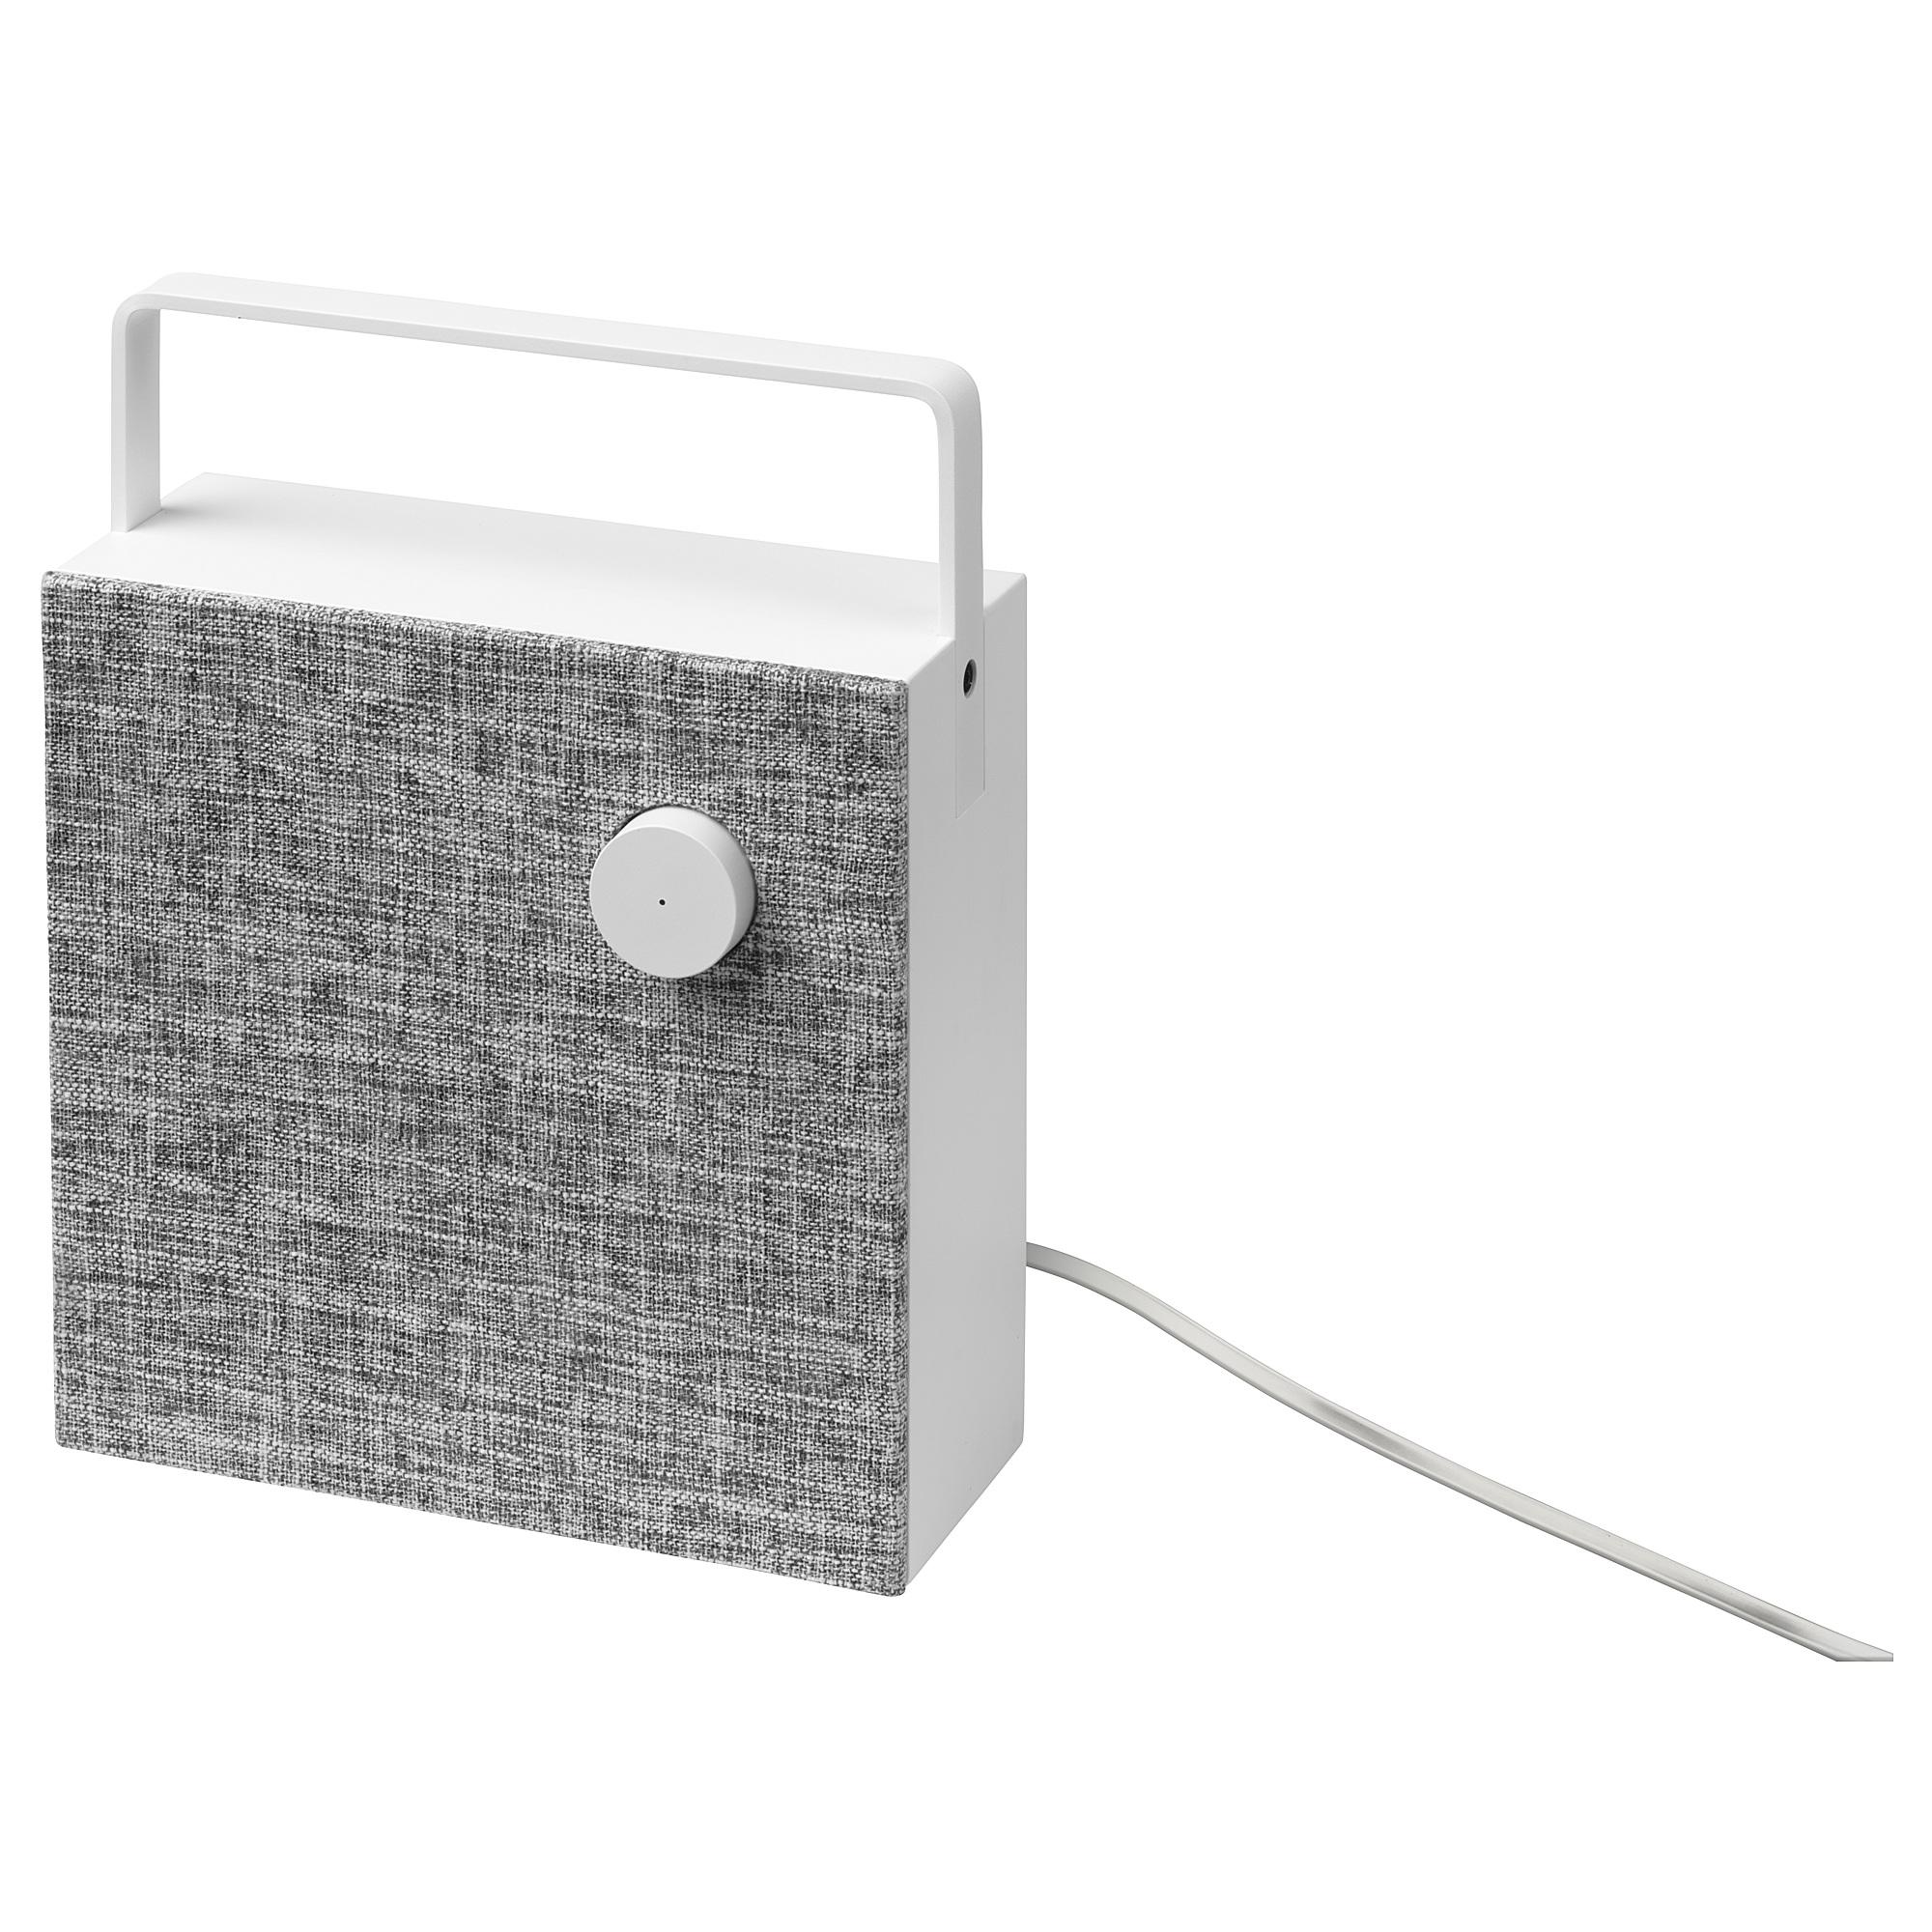 eneby-bluetooth-speaker-white__0620947_pe689804_s5.jpg